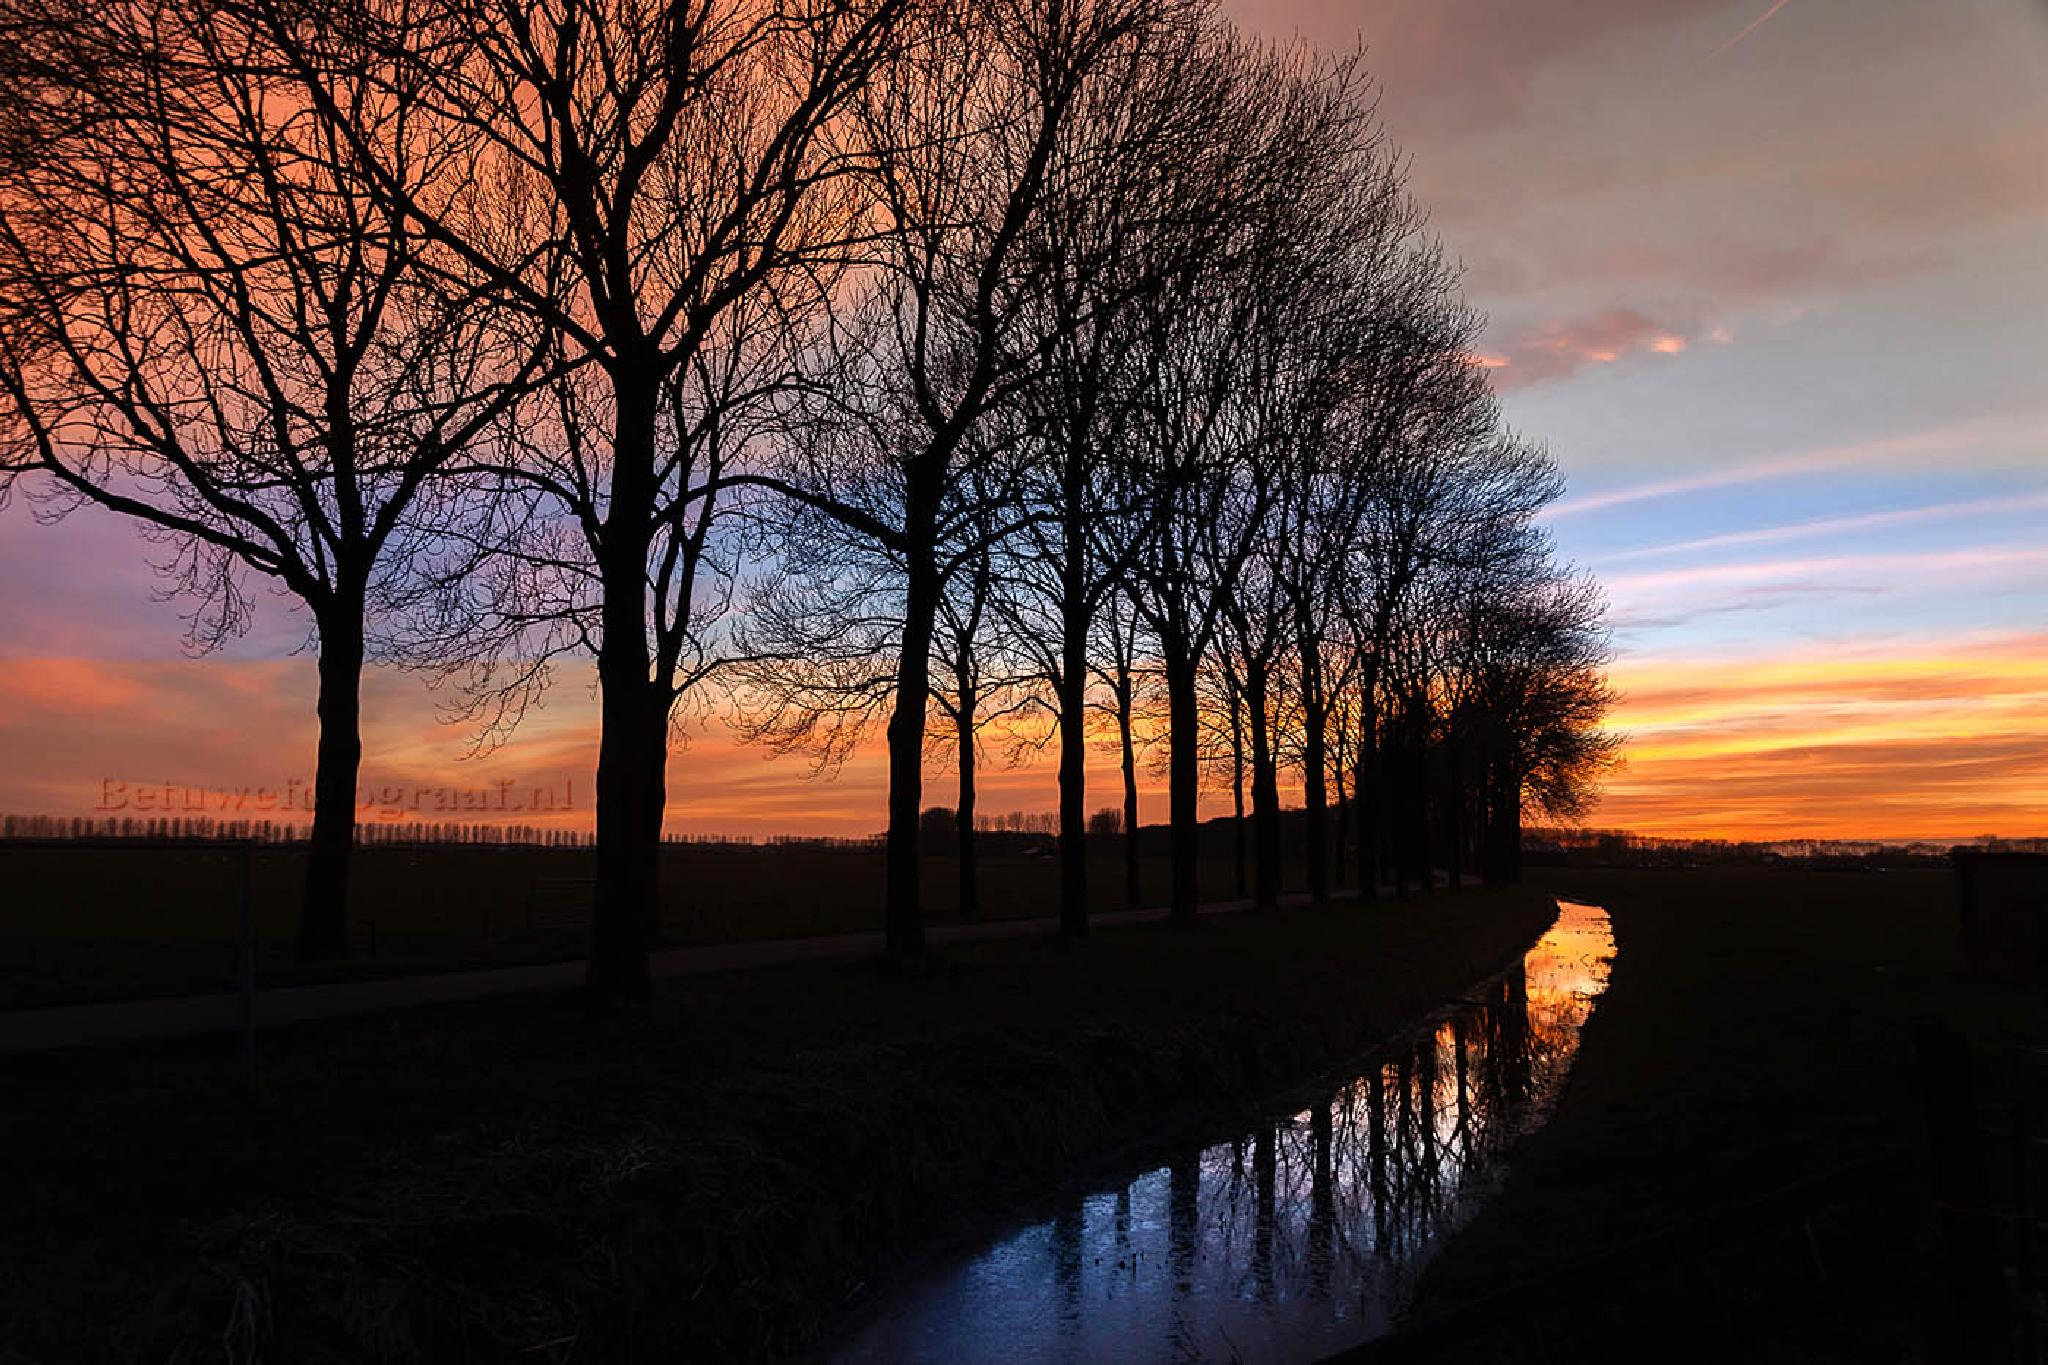 Evenings sunset in Holland by Betuwefotograaf